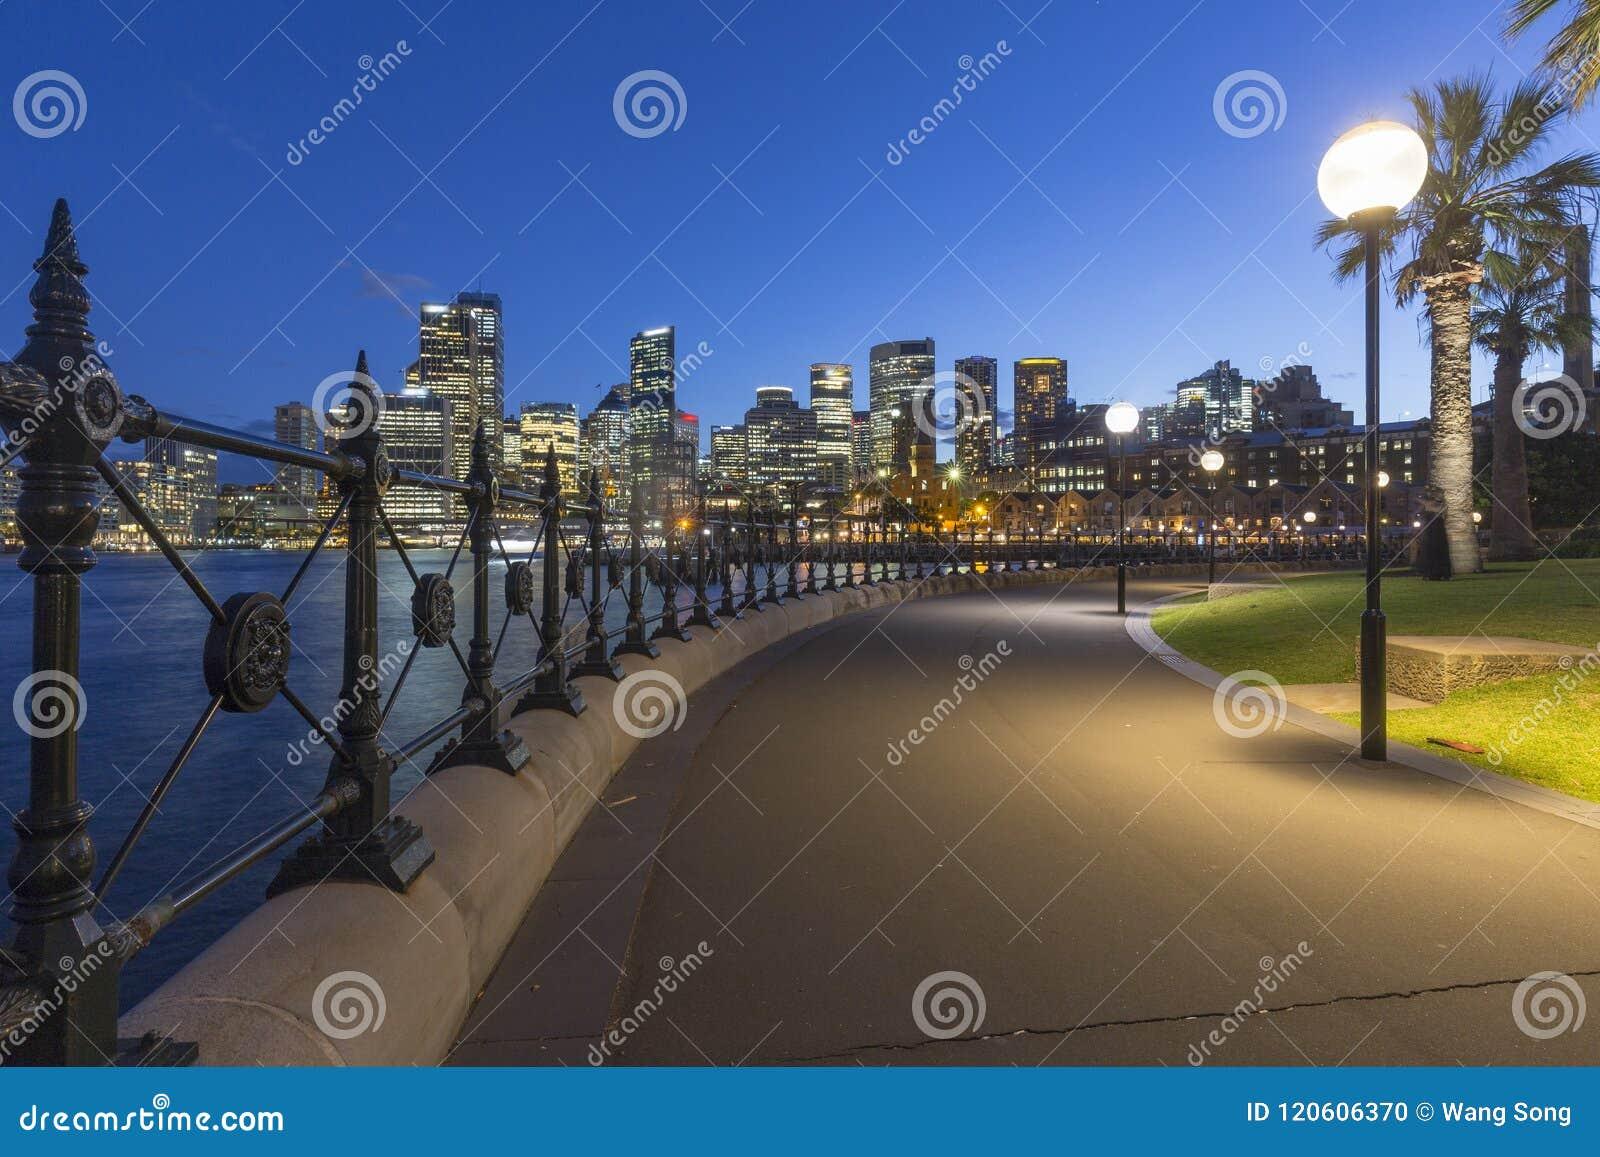 Архитектура города Сиднея на ноче